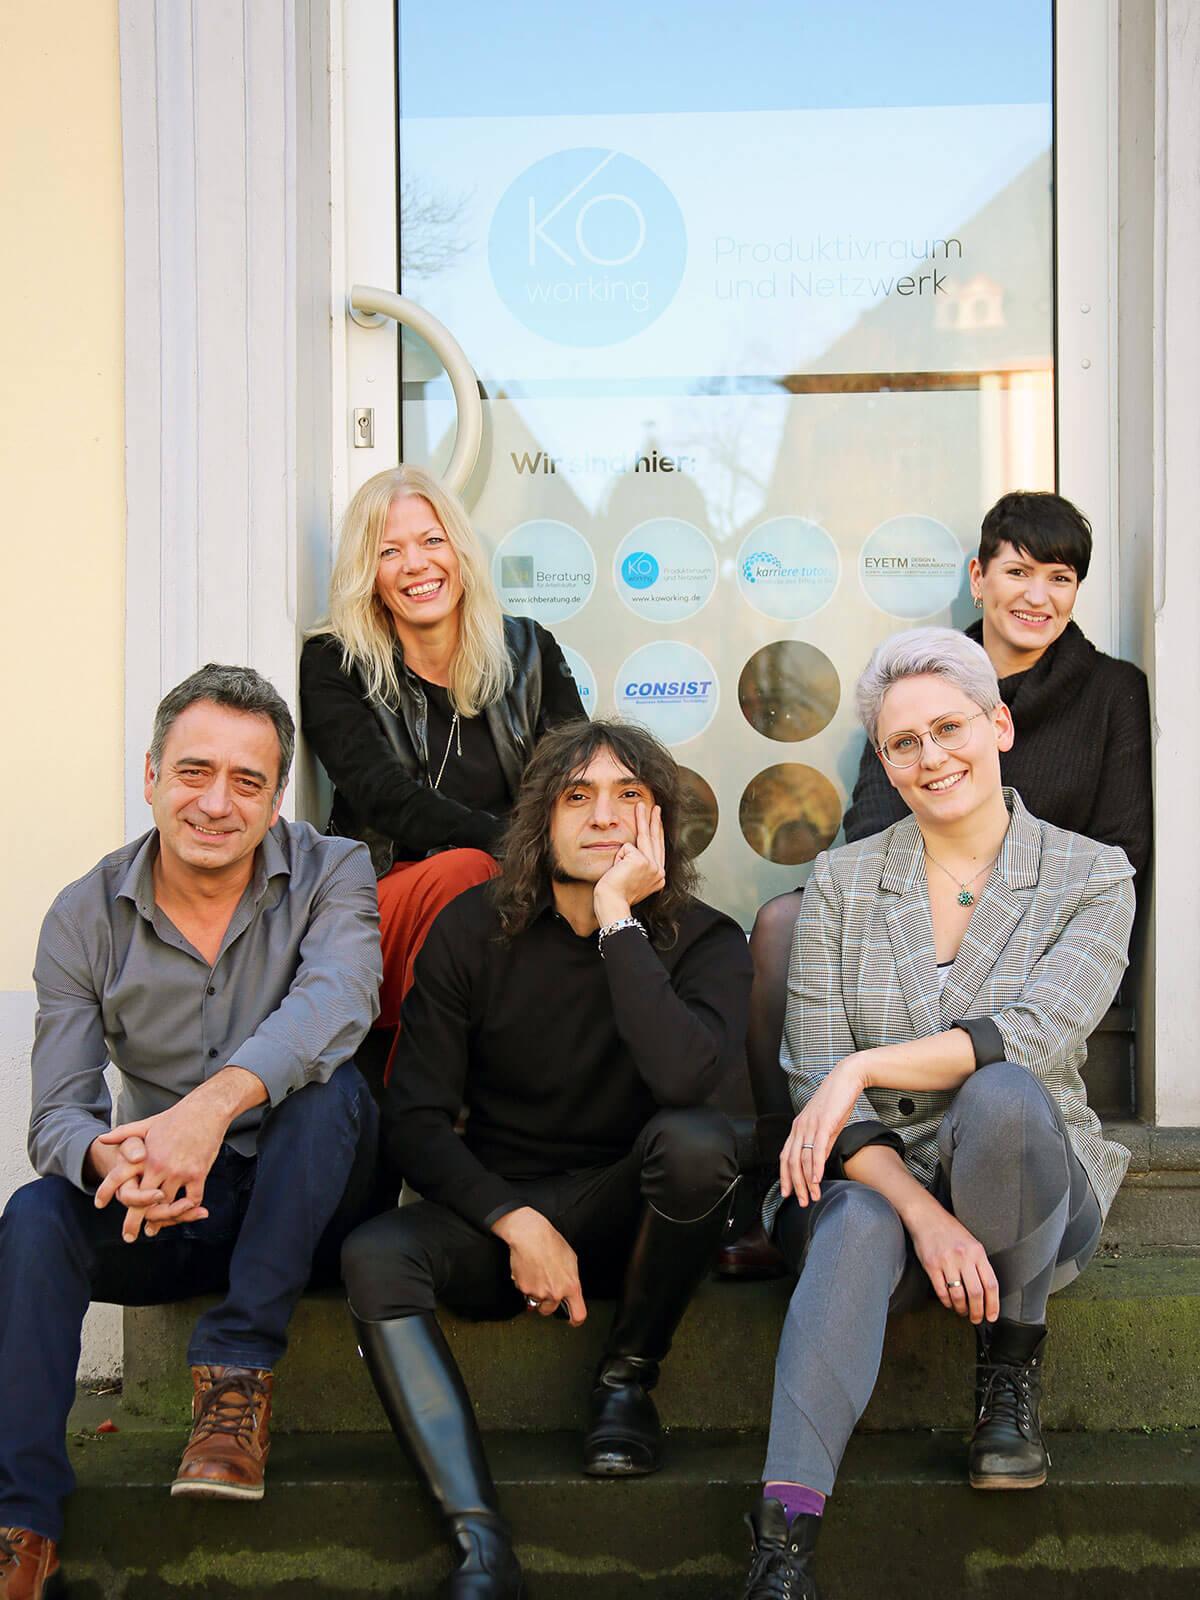 Kooperationen – KOworking Koblenz – I.C.H. Beratung